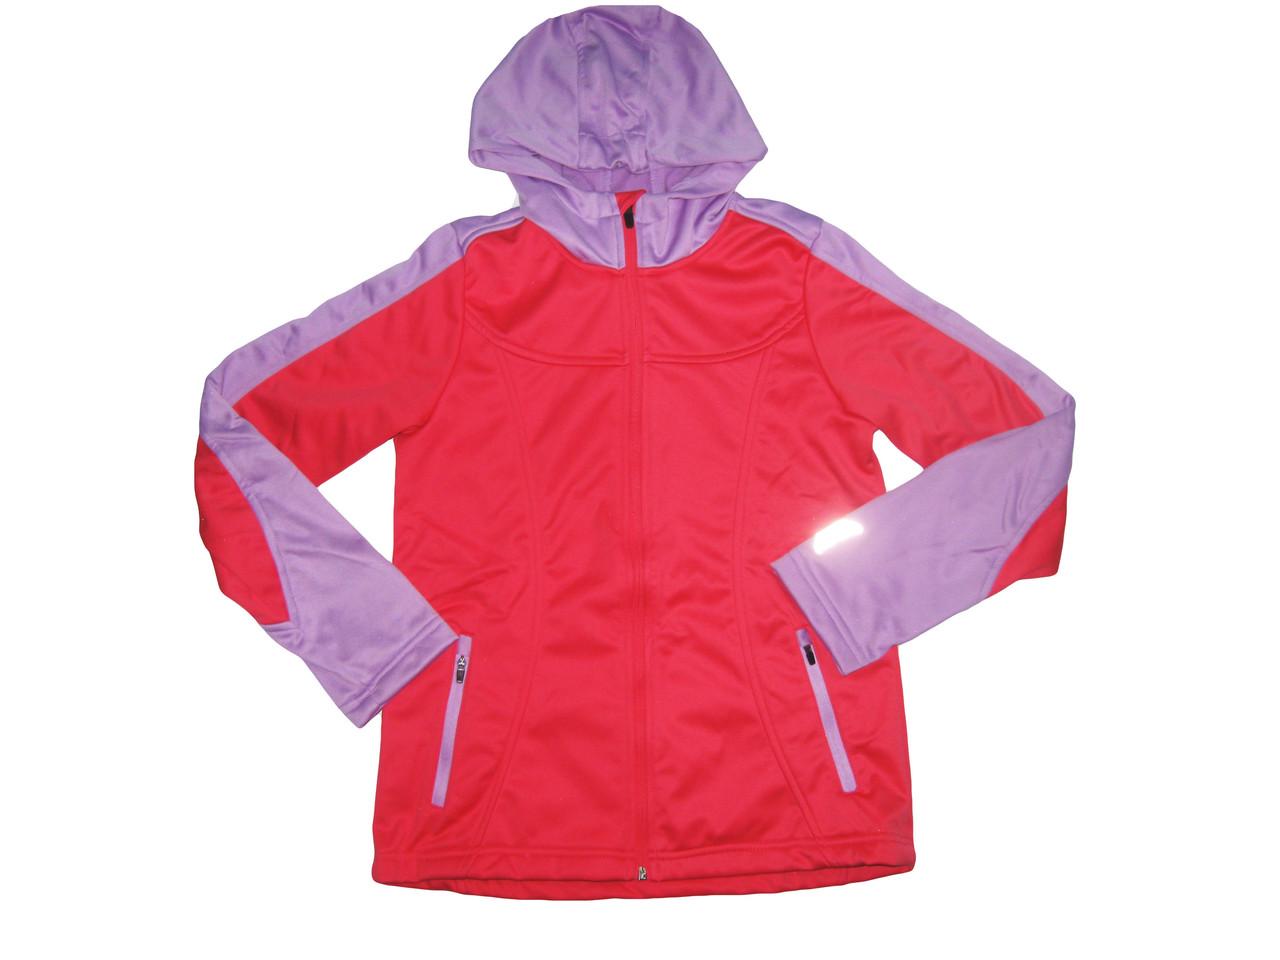 Куртка для девочки на флисе, CRIVIT, размер 158/164, арт. Л-219